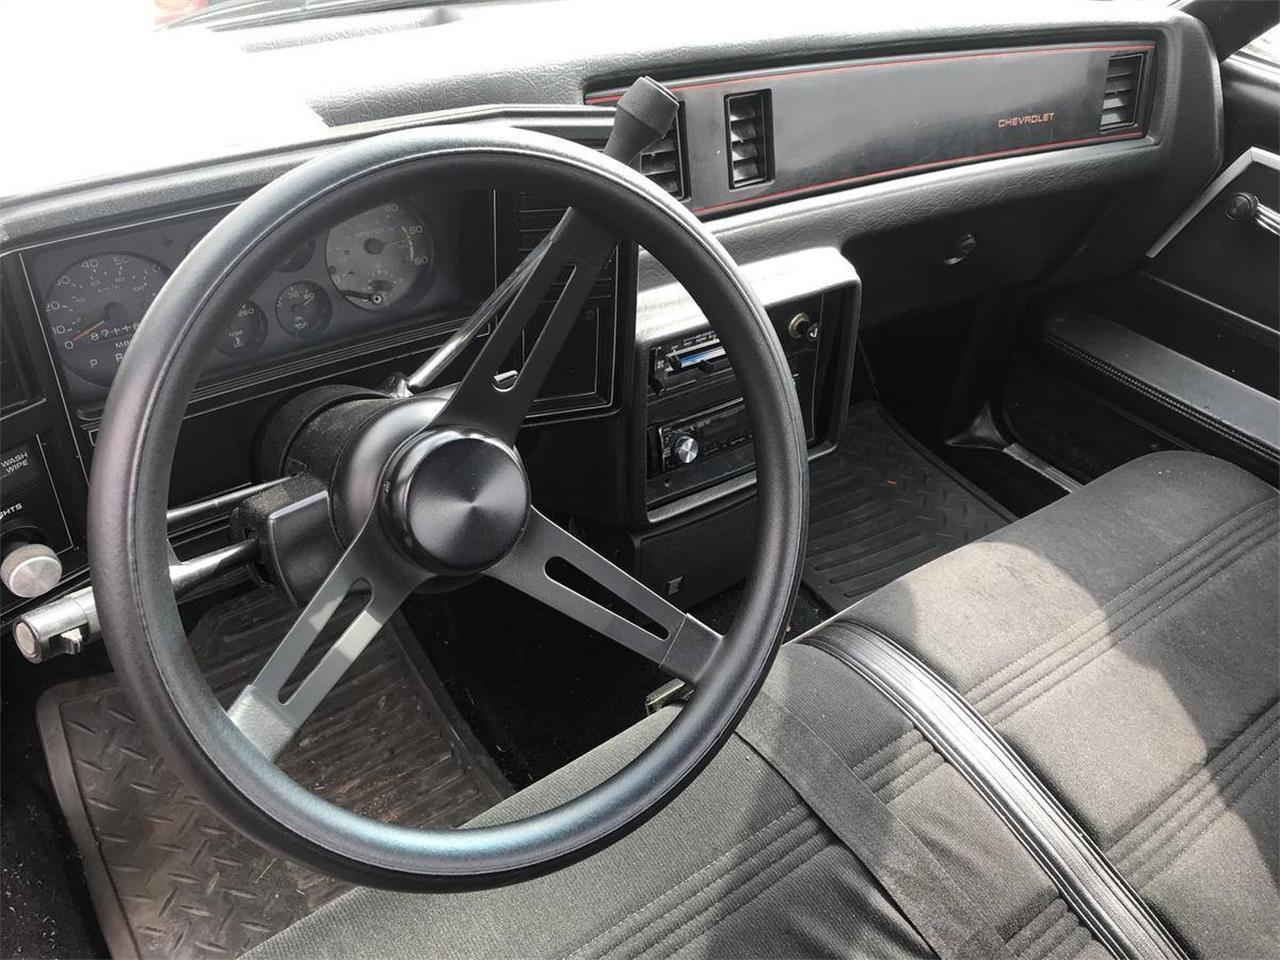 1979 Chevrolet El Camino (CC-1337583) for sale in Utica, Ohio